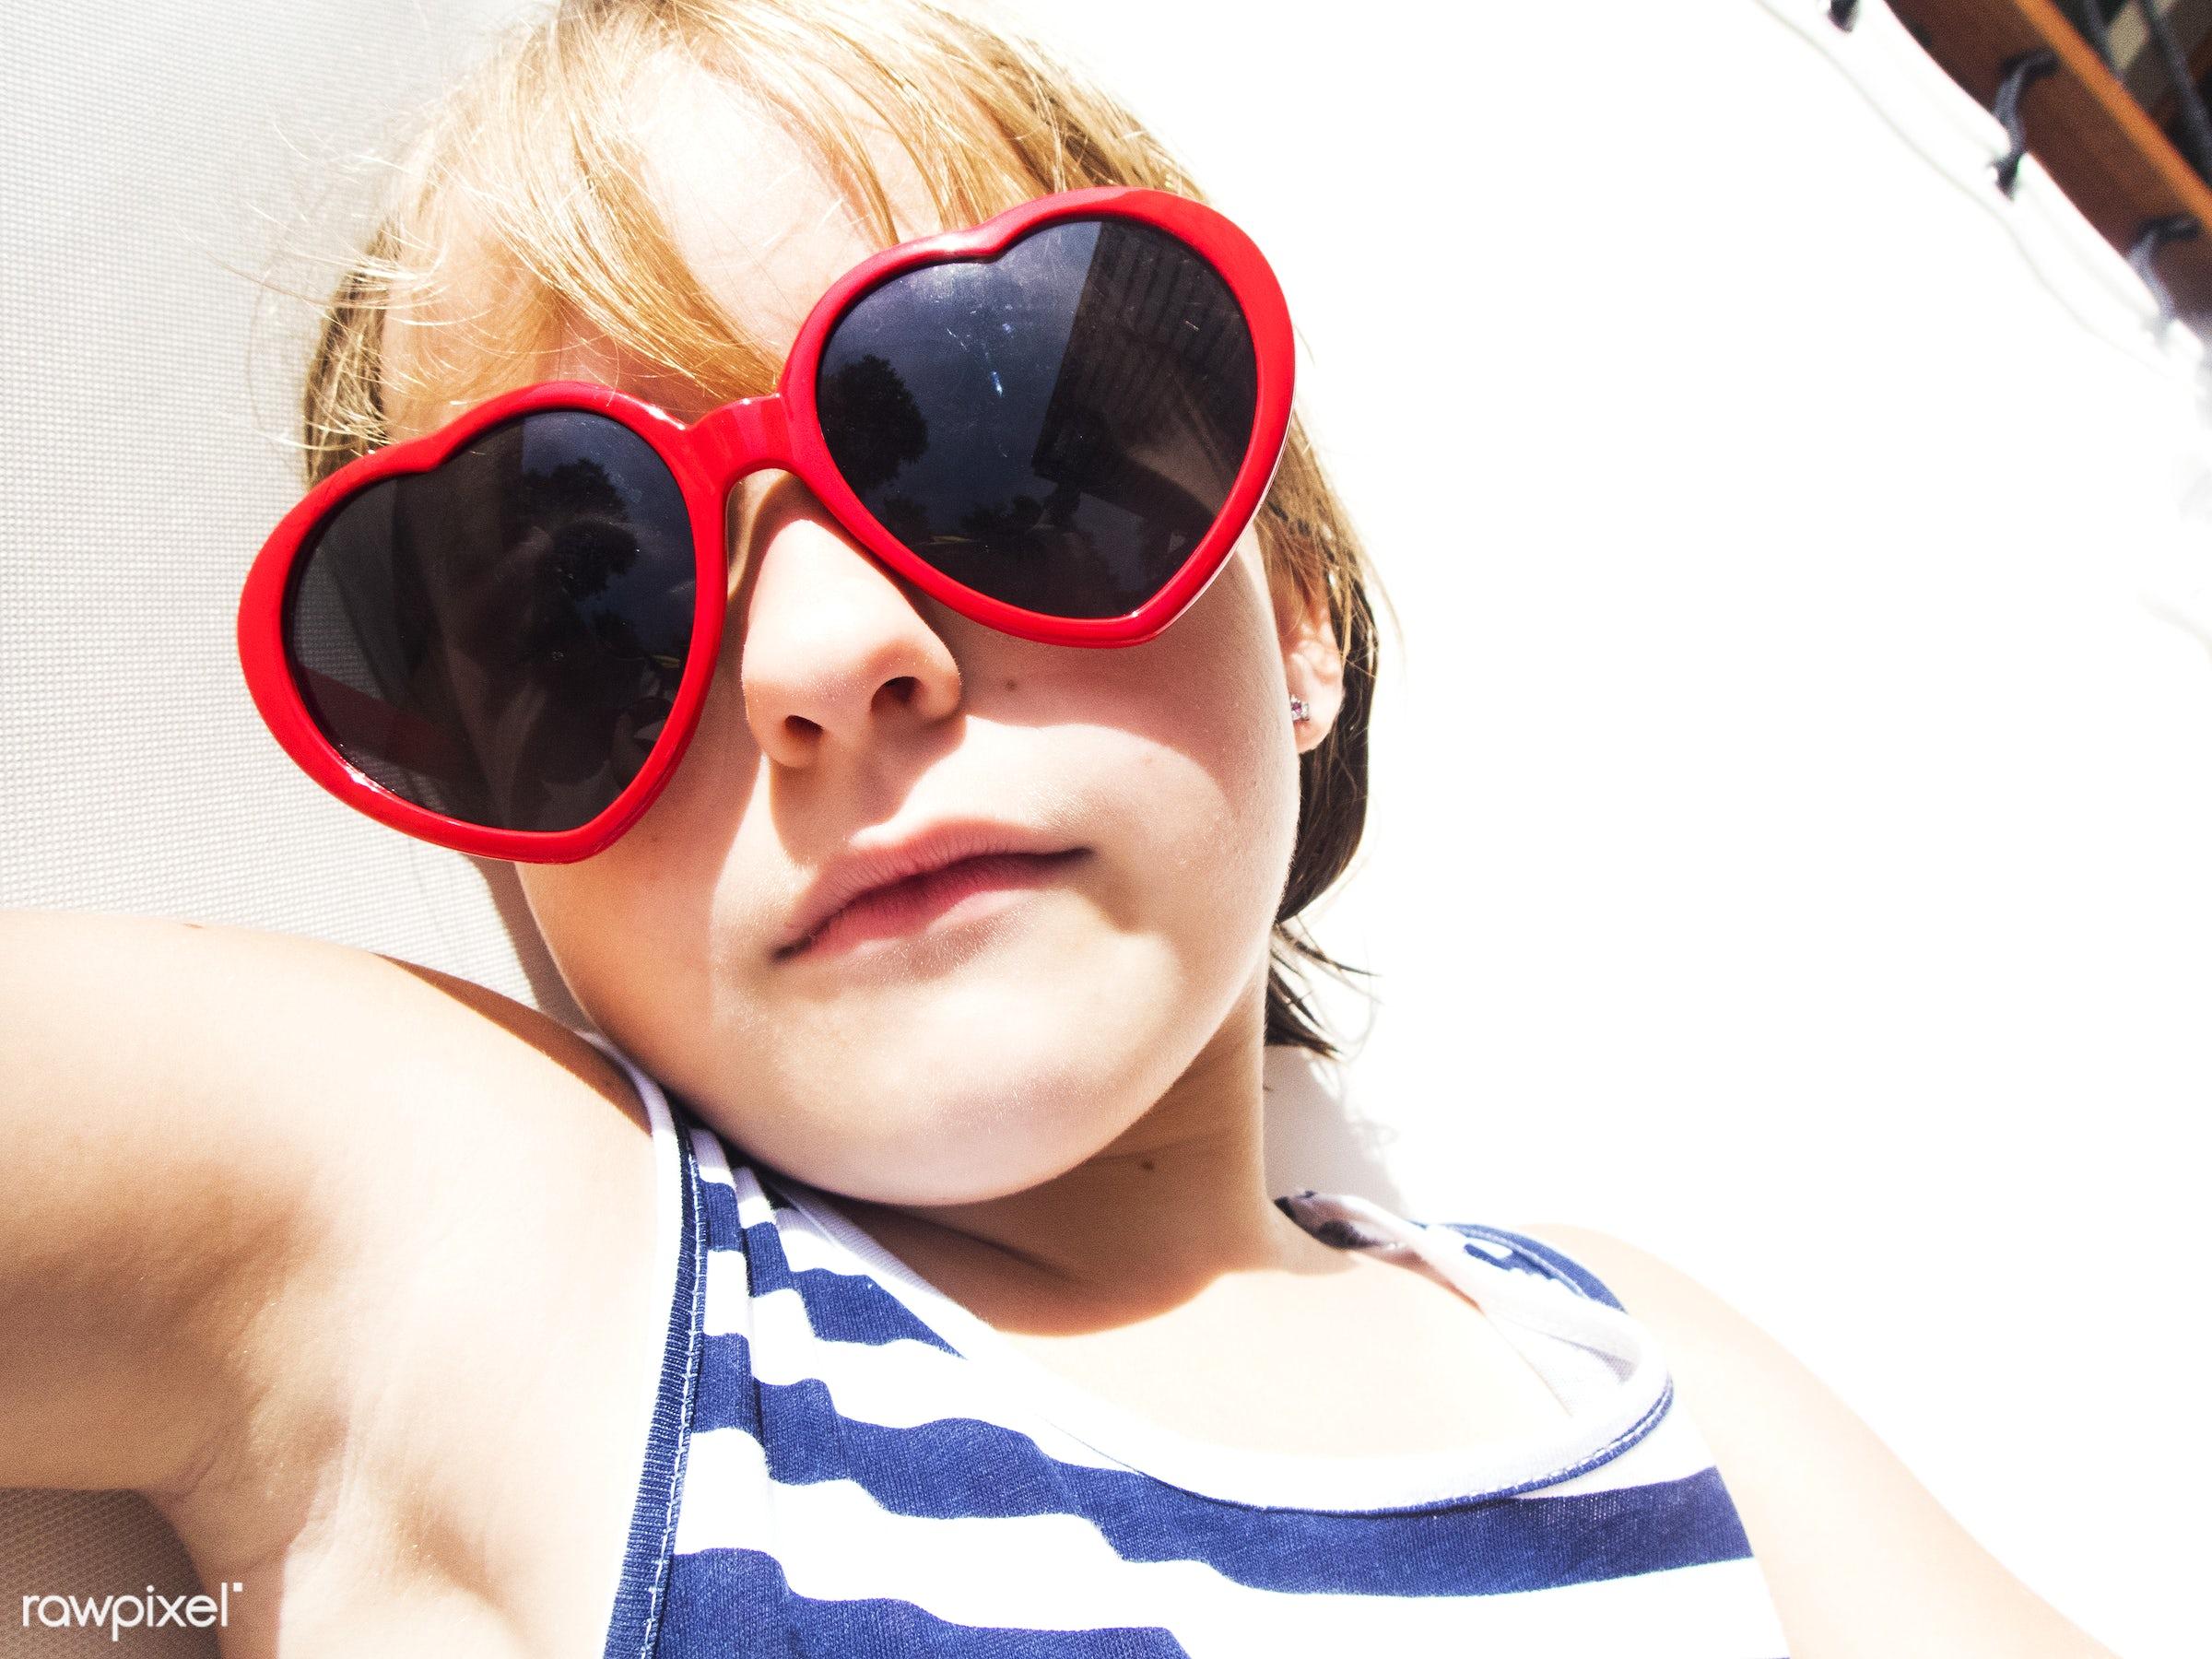 sunbath, alone, blonde, cheerful, child, closeup, enjoying, girl, holiday, kid, leisure, outdoors, relax, summer, sunglasses...